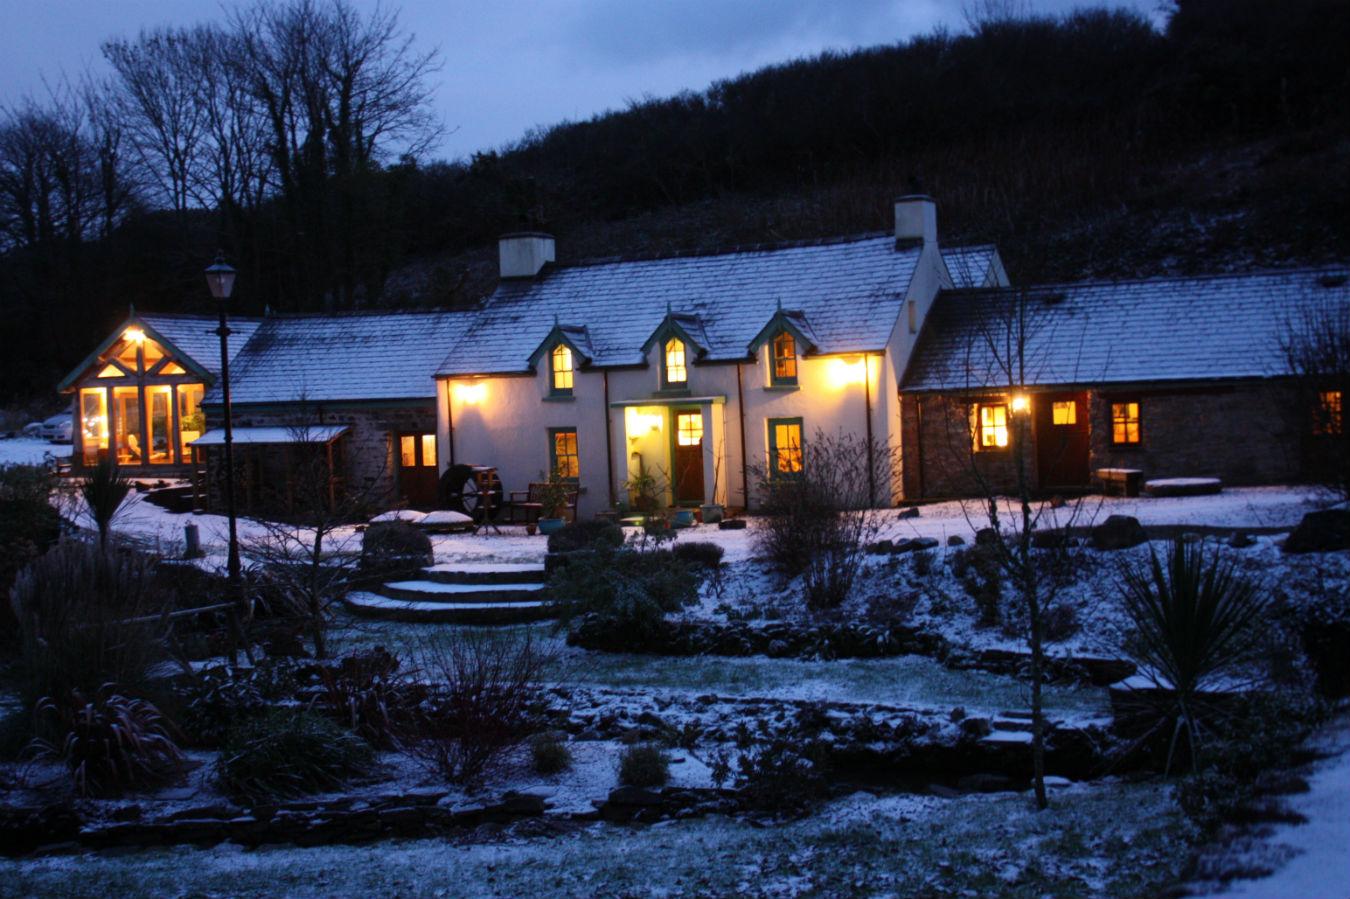 Roch Mill in snow near Newgale, Pembrokeshire